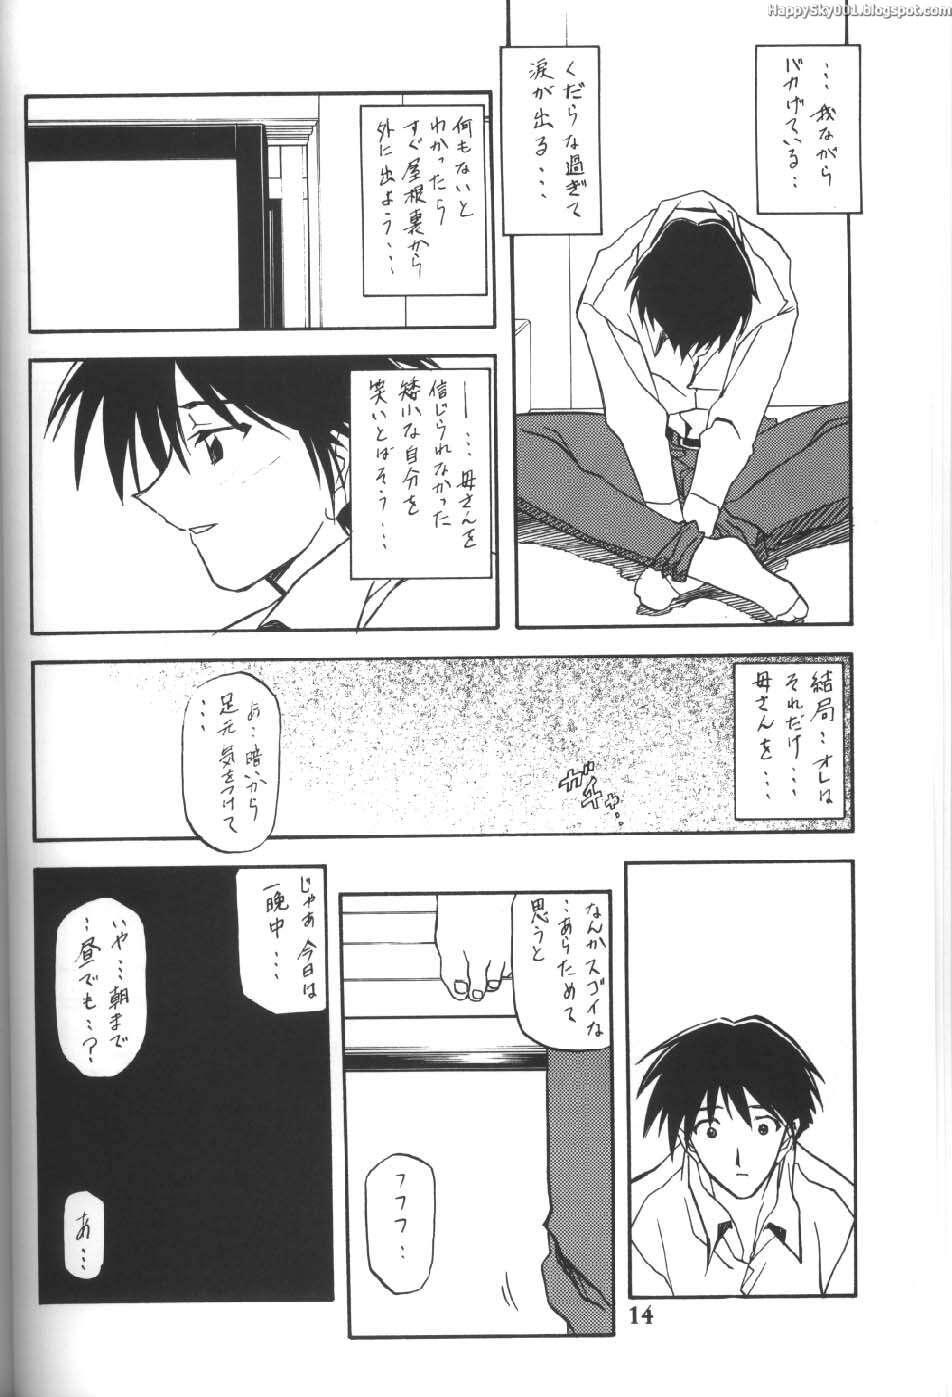 Yama Hime no Mi 12